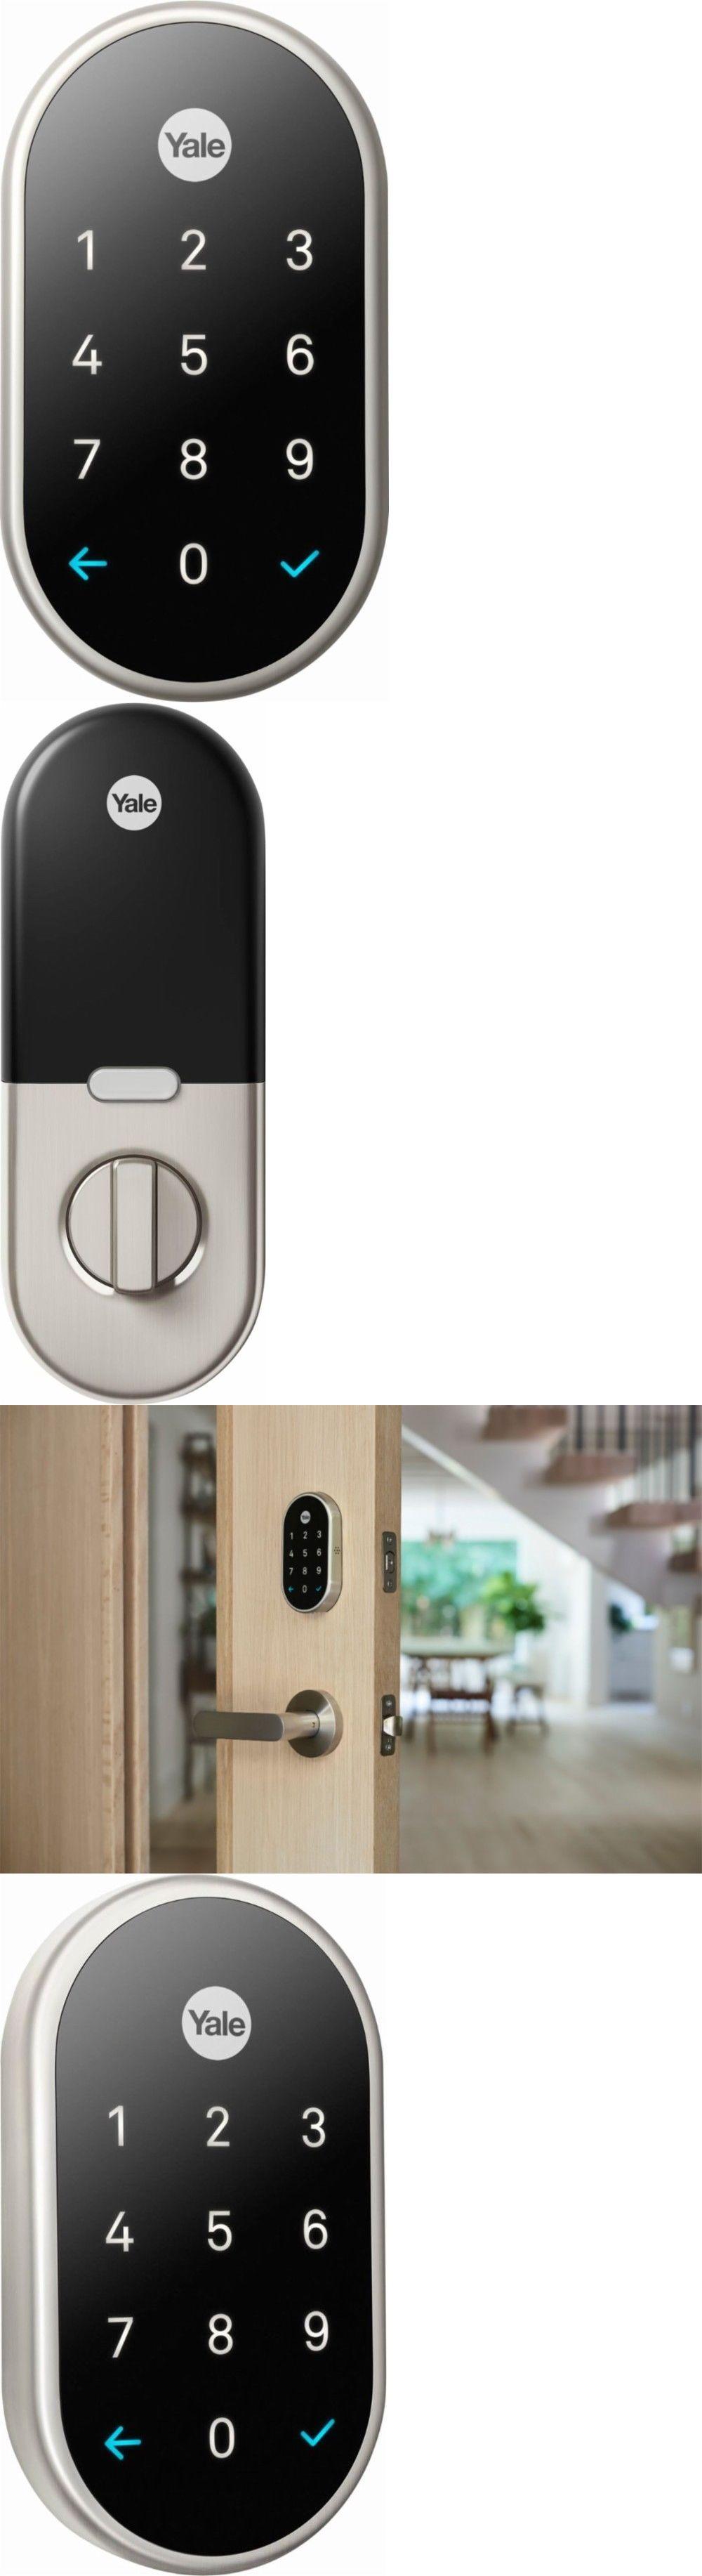 Door Locks and Lock Mechanisms 180966: Nest X Yale - Smart